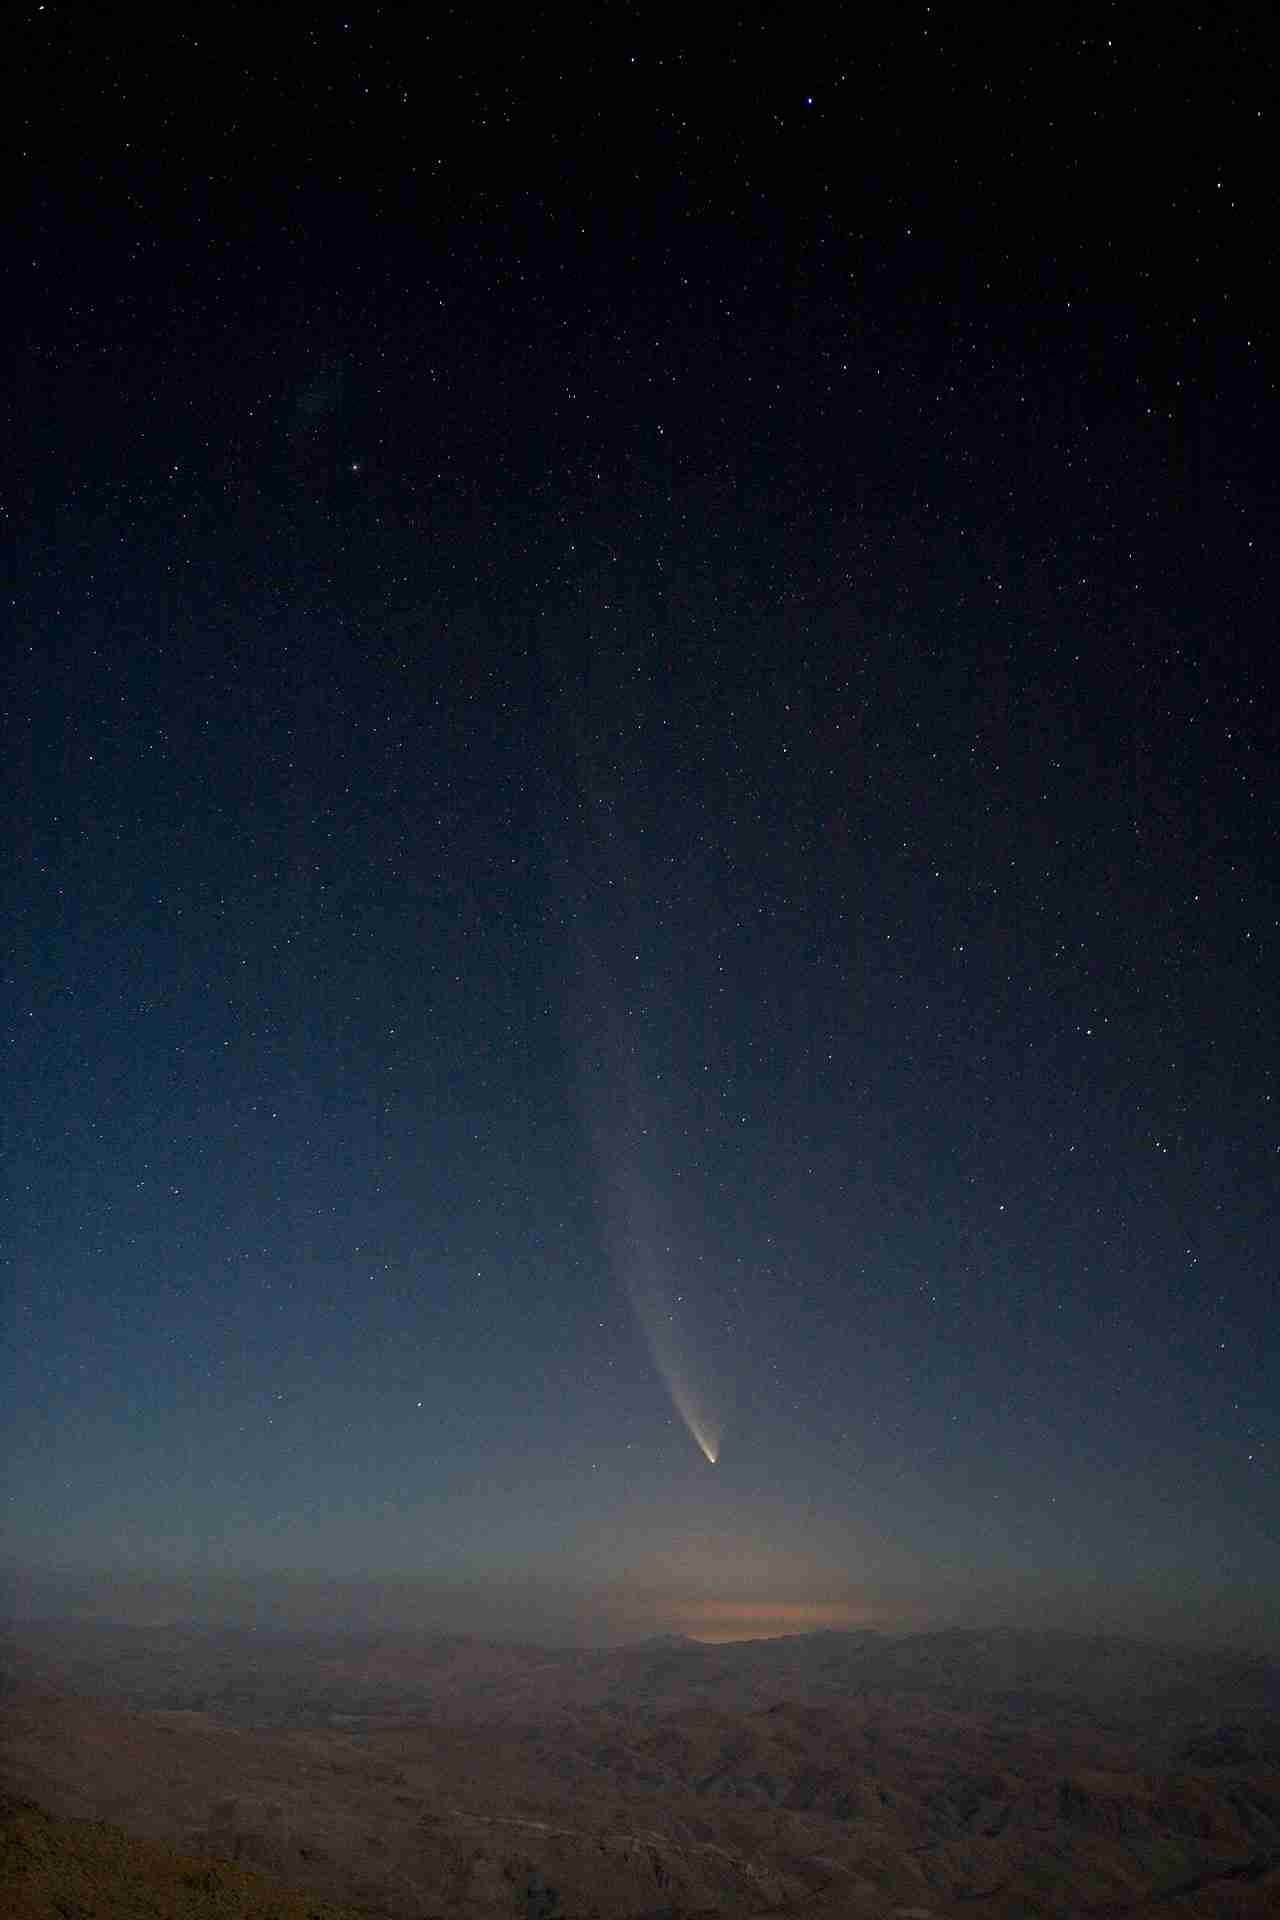 Comète C/2006 P1 McNaught - 2